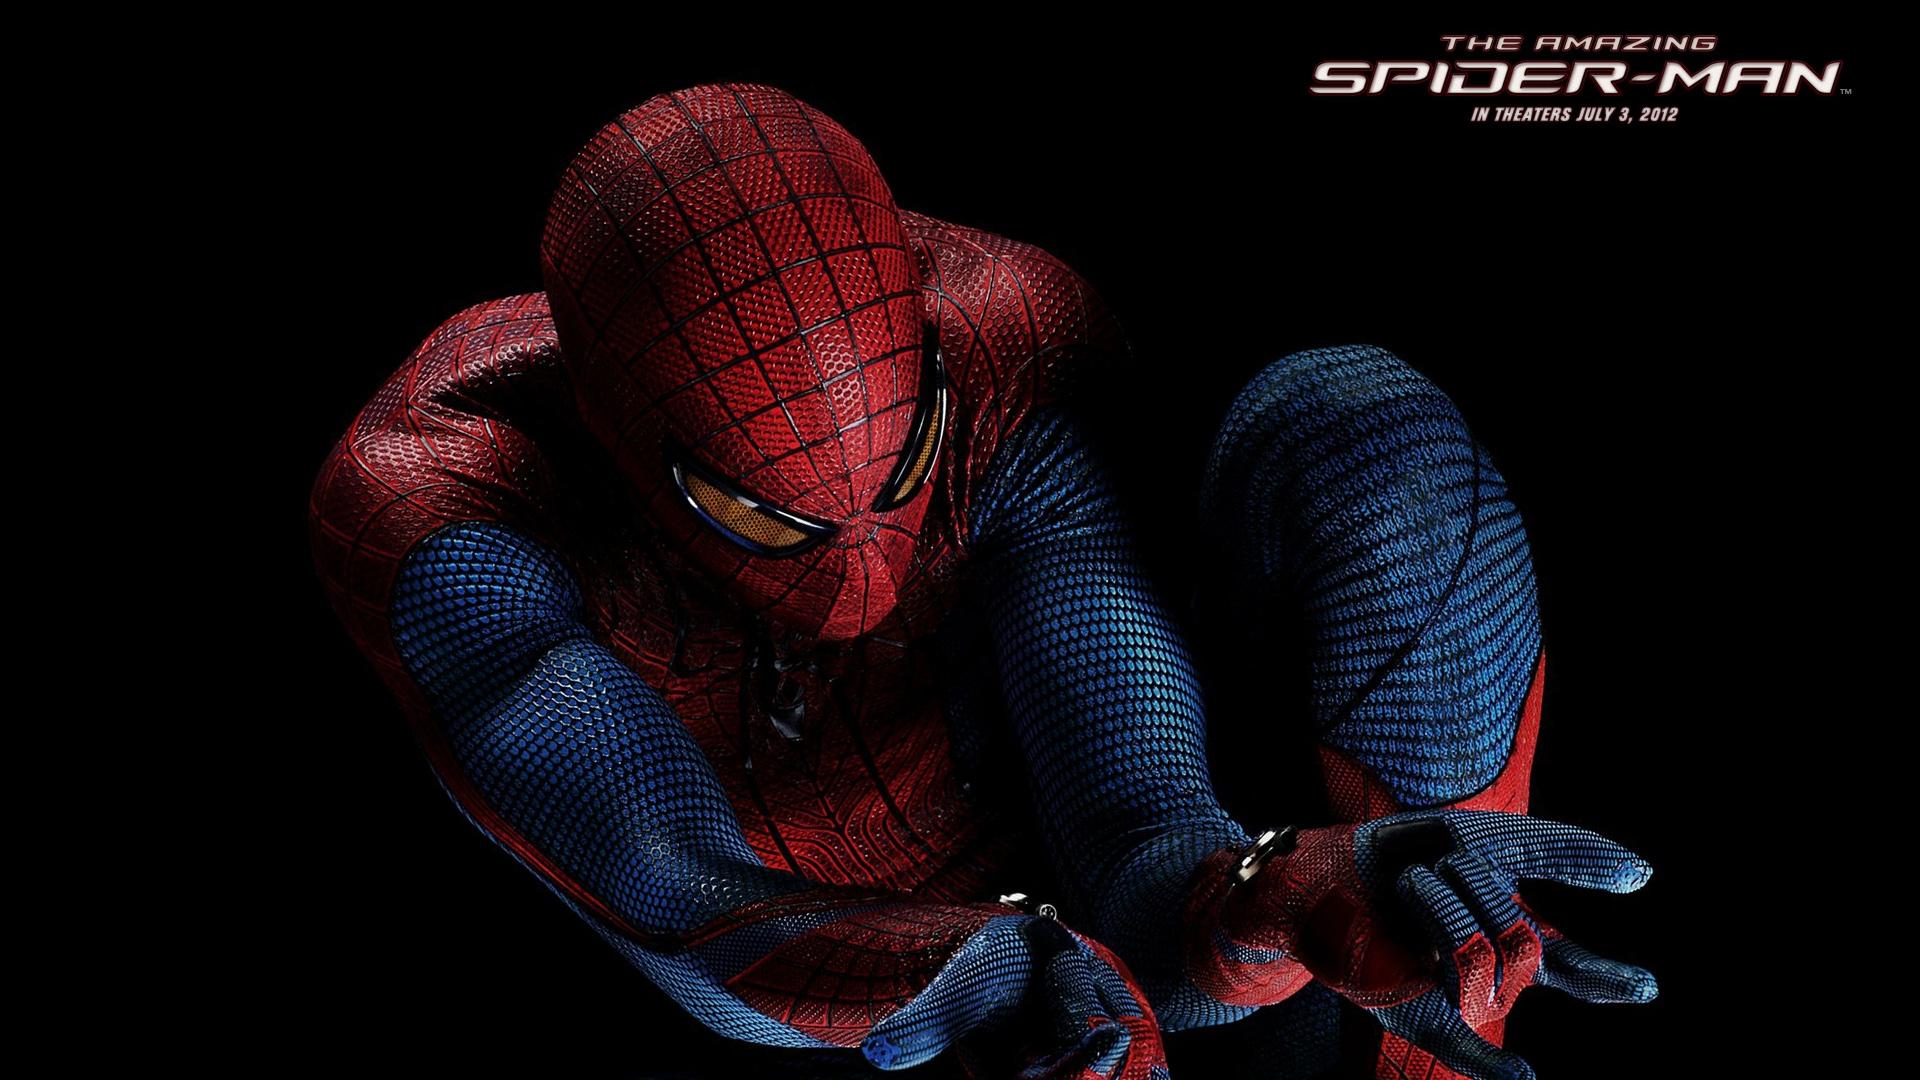 Jordan Carver The Amazing Spiderman New Costume Shift 940153 Wallpaper